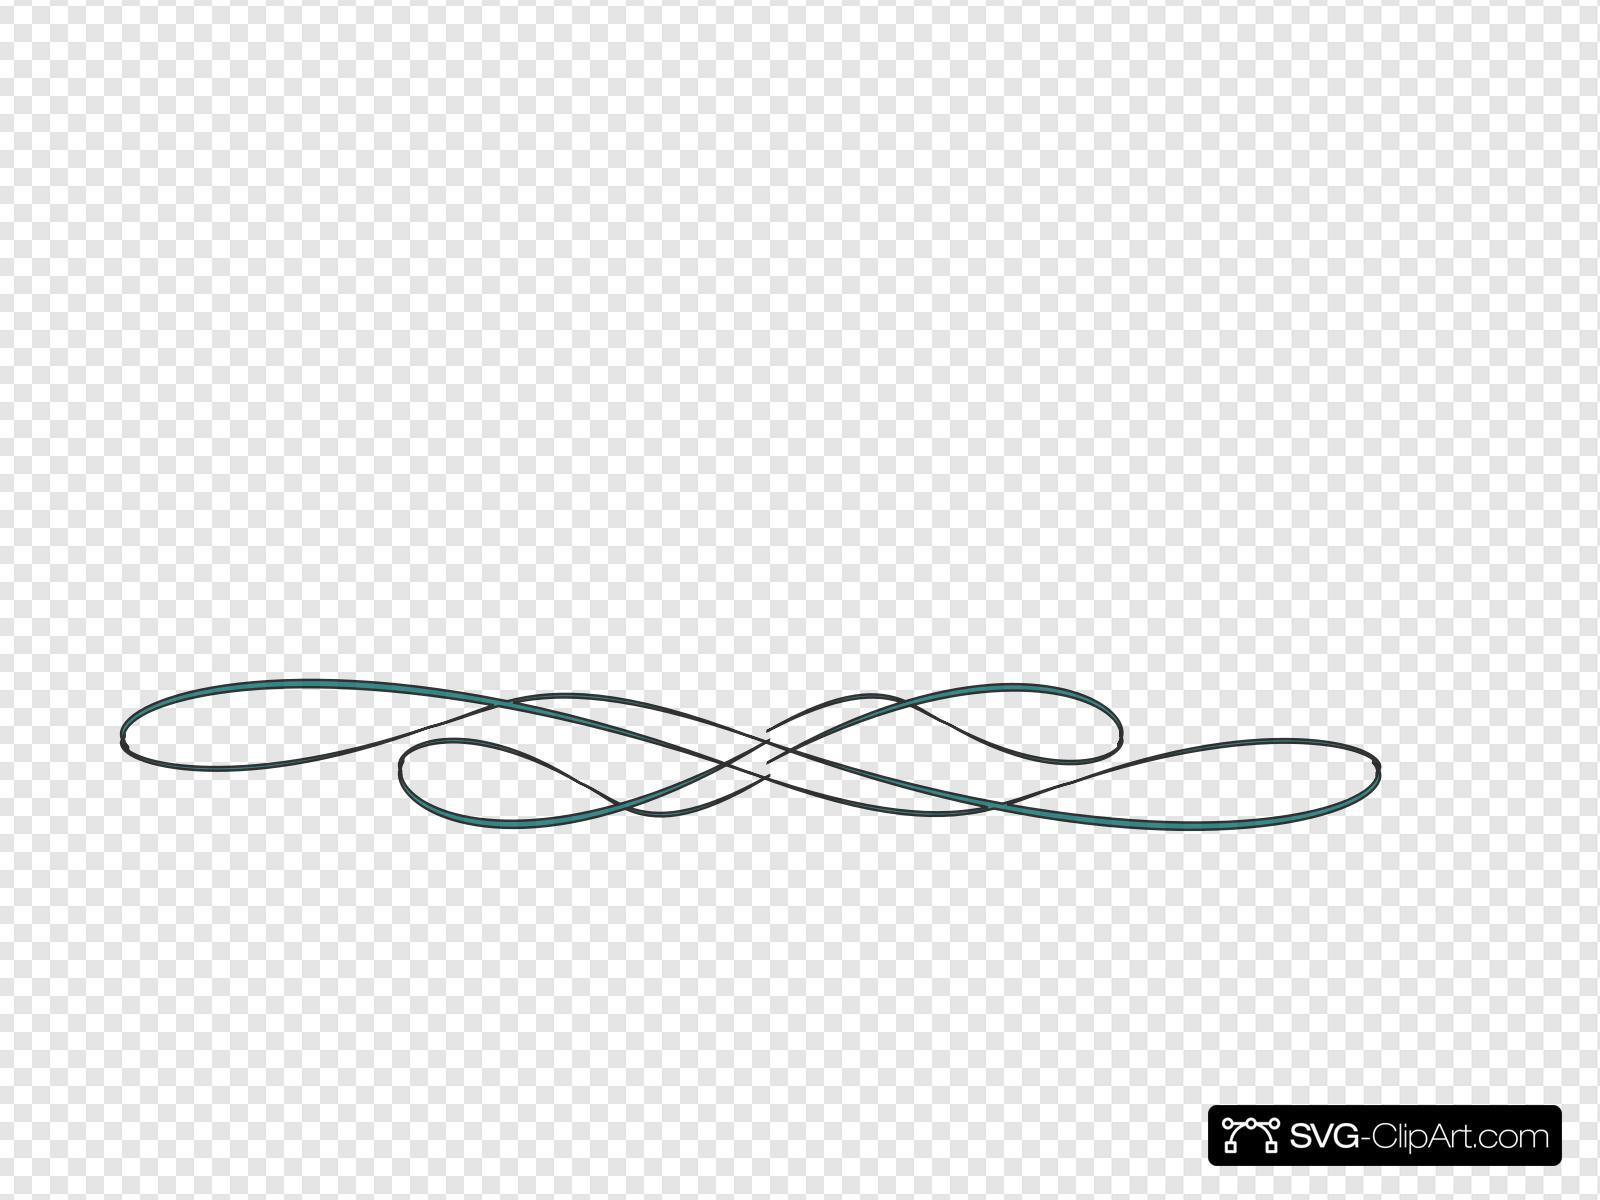 Beautiful Swirls Underline Clip art, Icon and SVG.